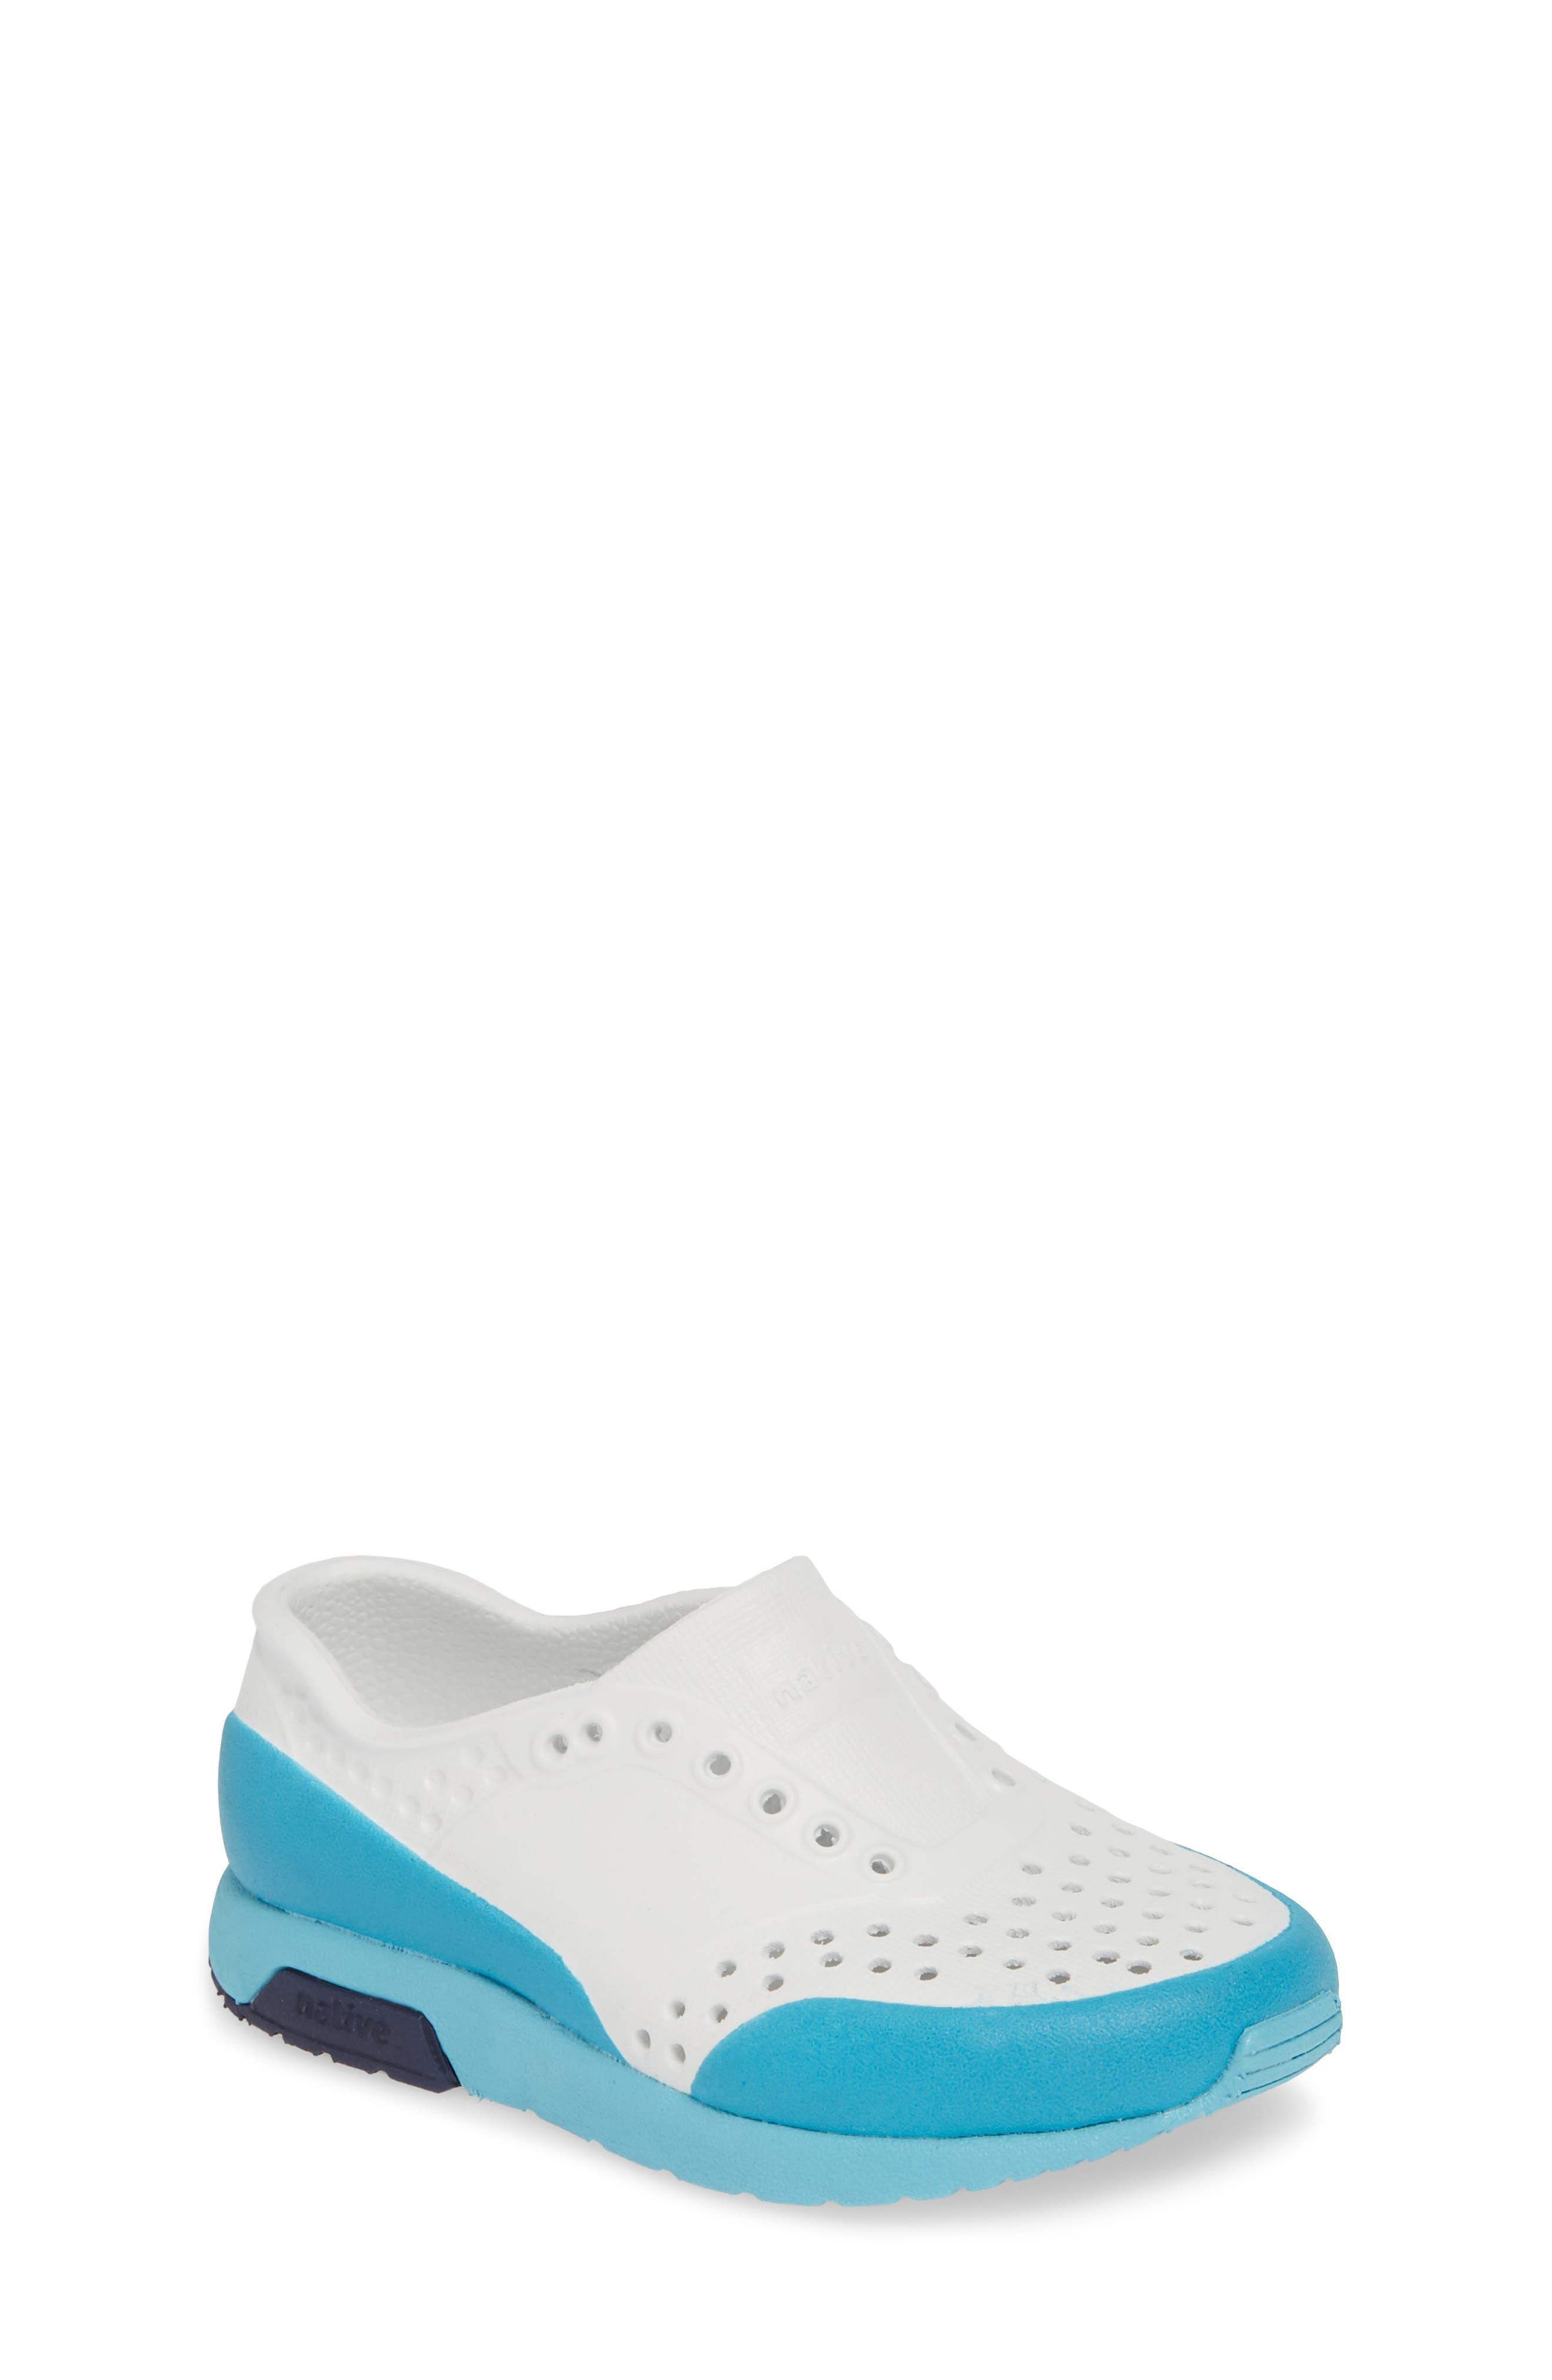 Native Shoes Kids Lennox Slip-On